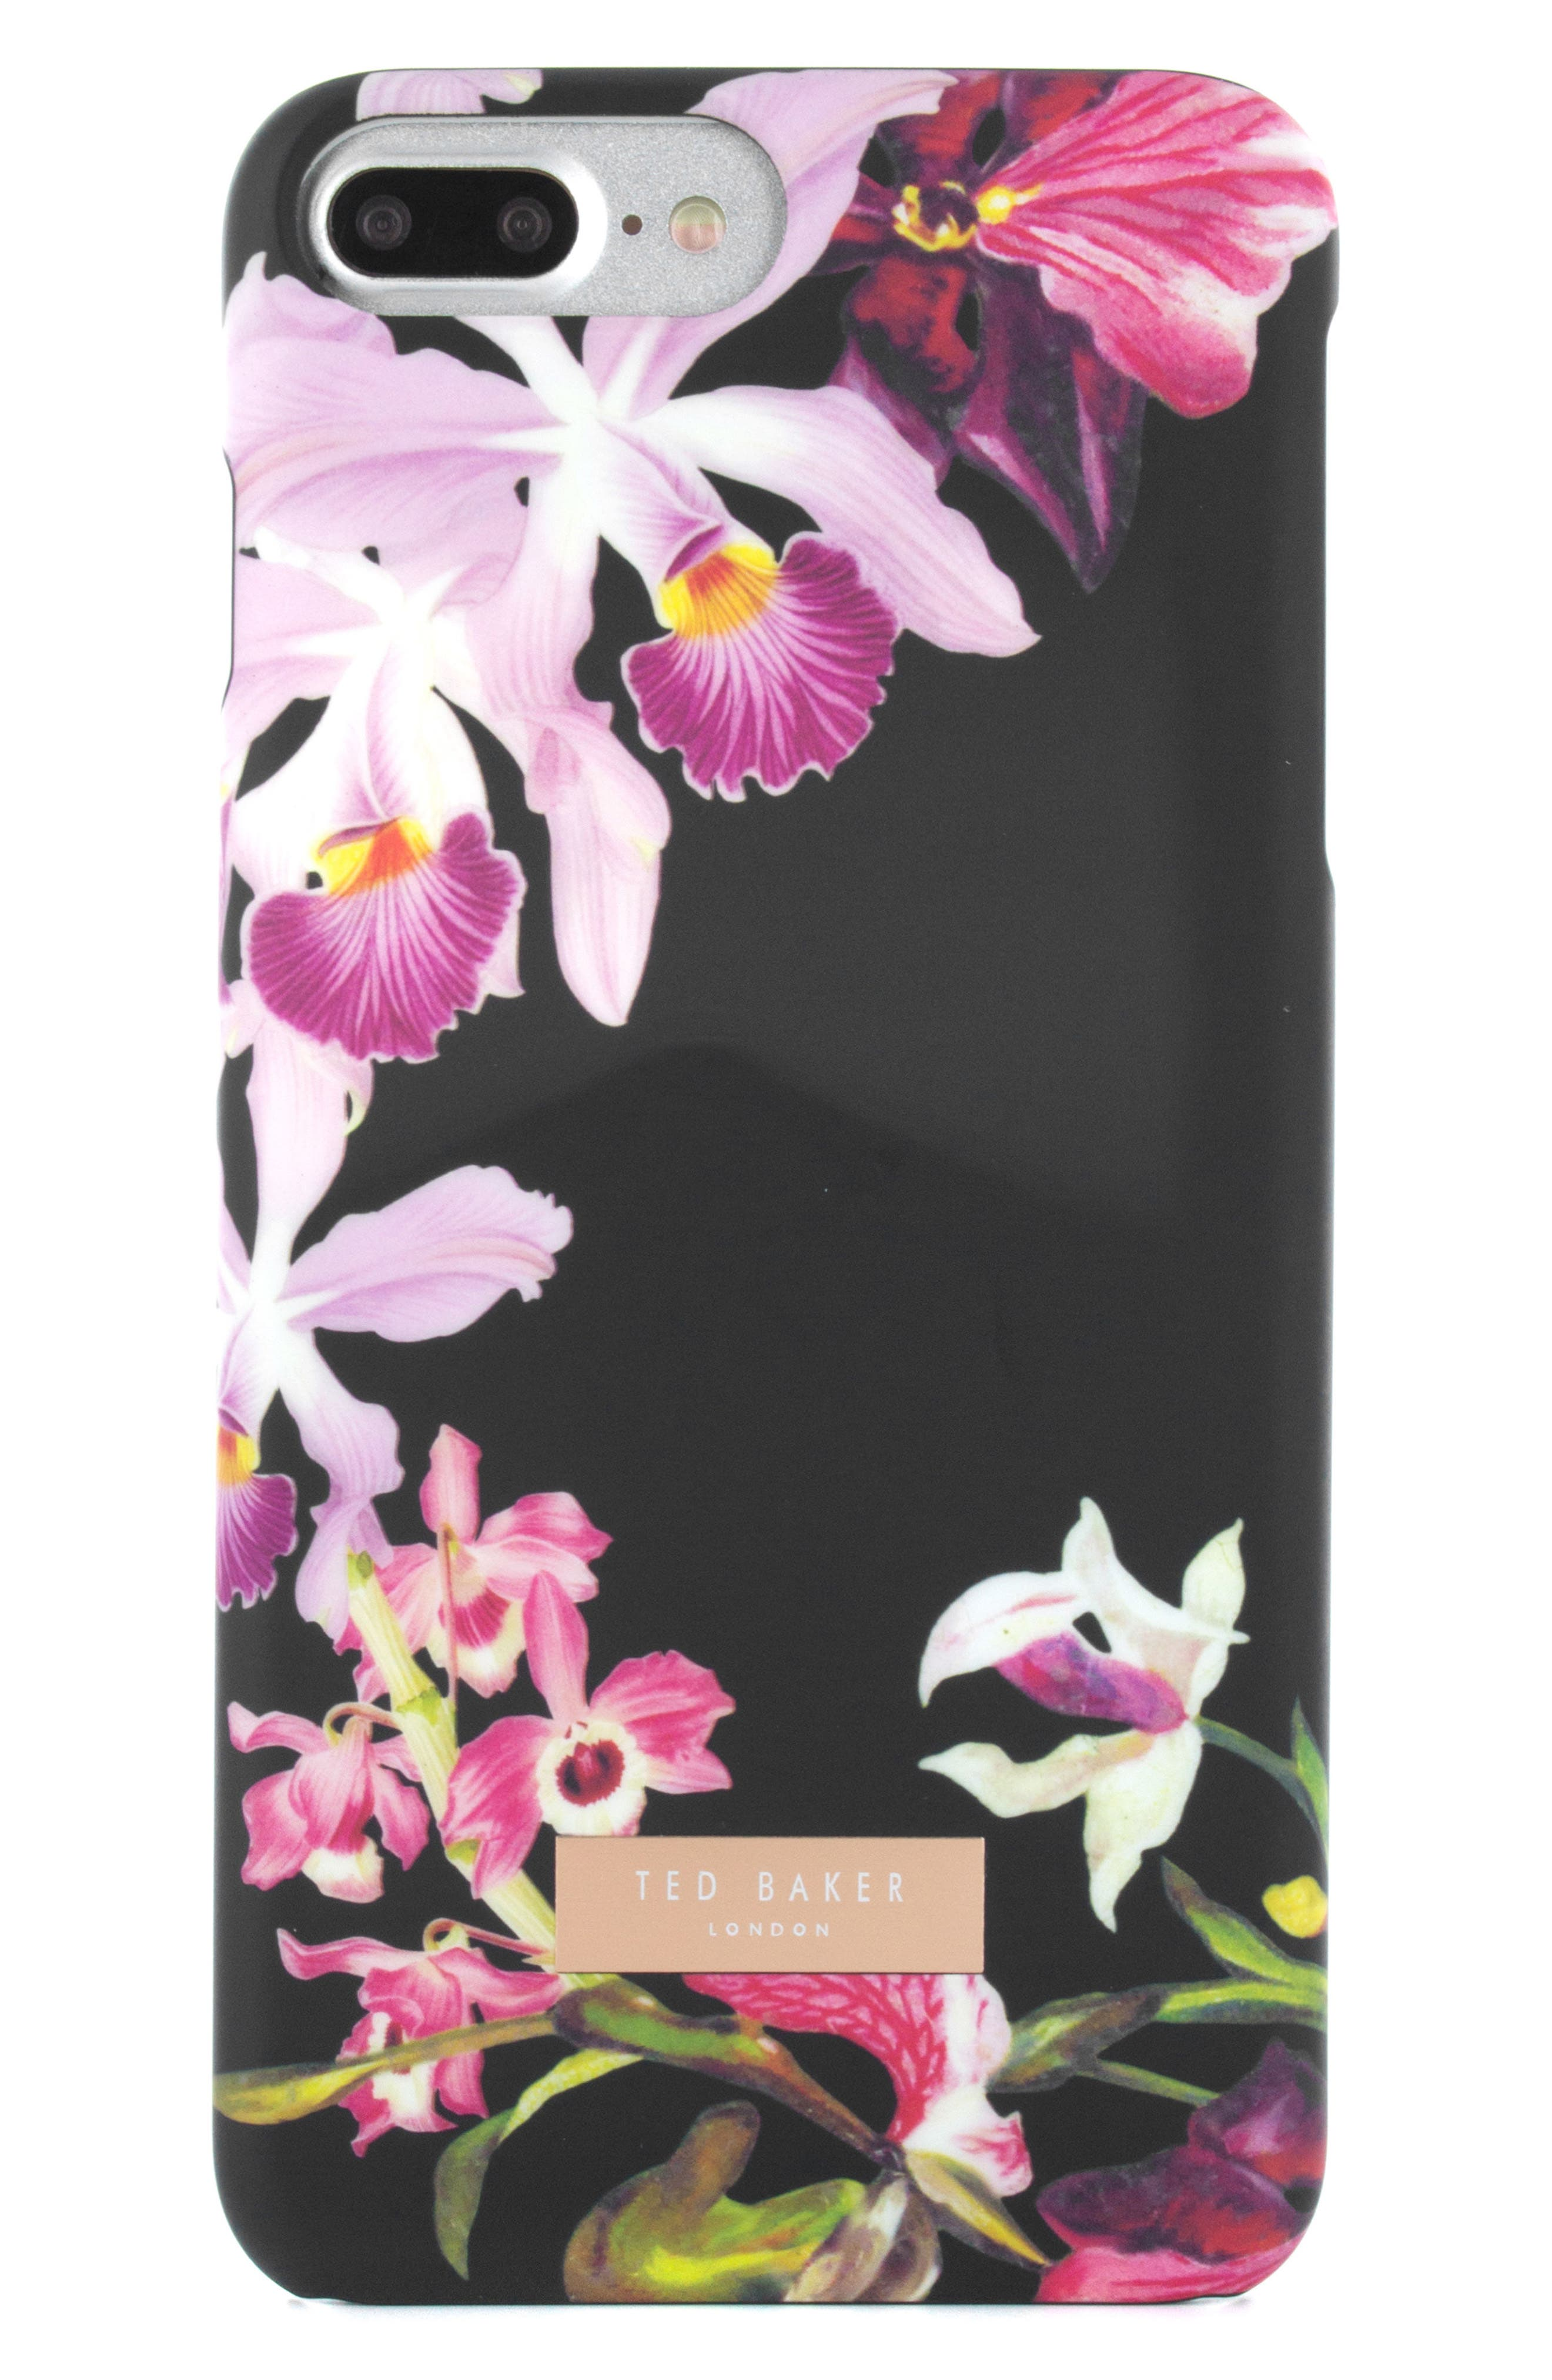 Ted Baker London Sidra Garden iPhone 6/6s/7/8 Case